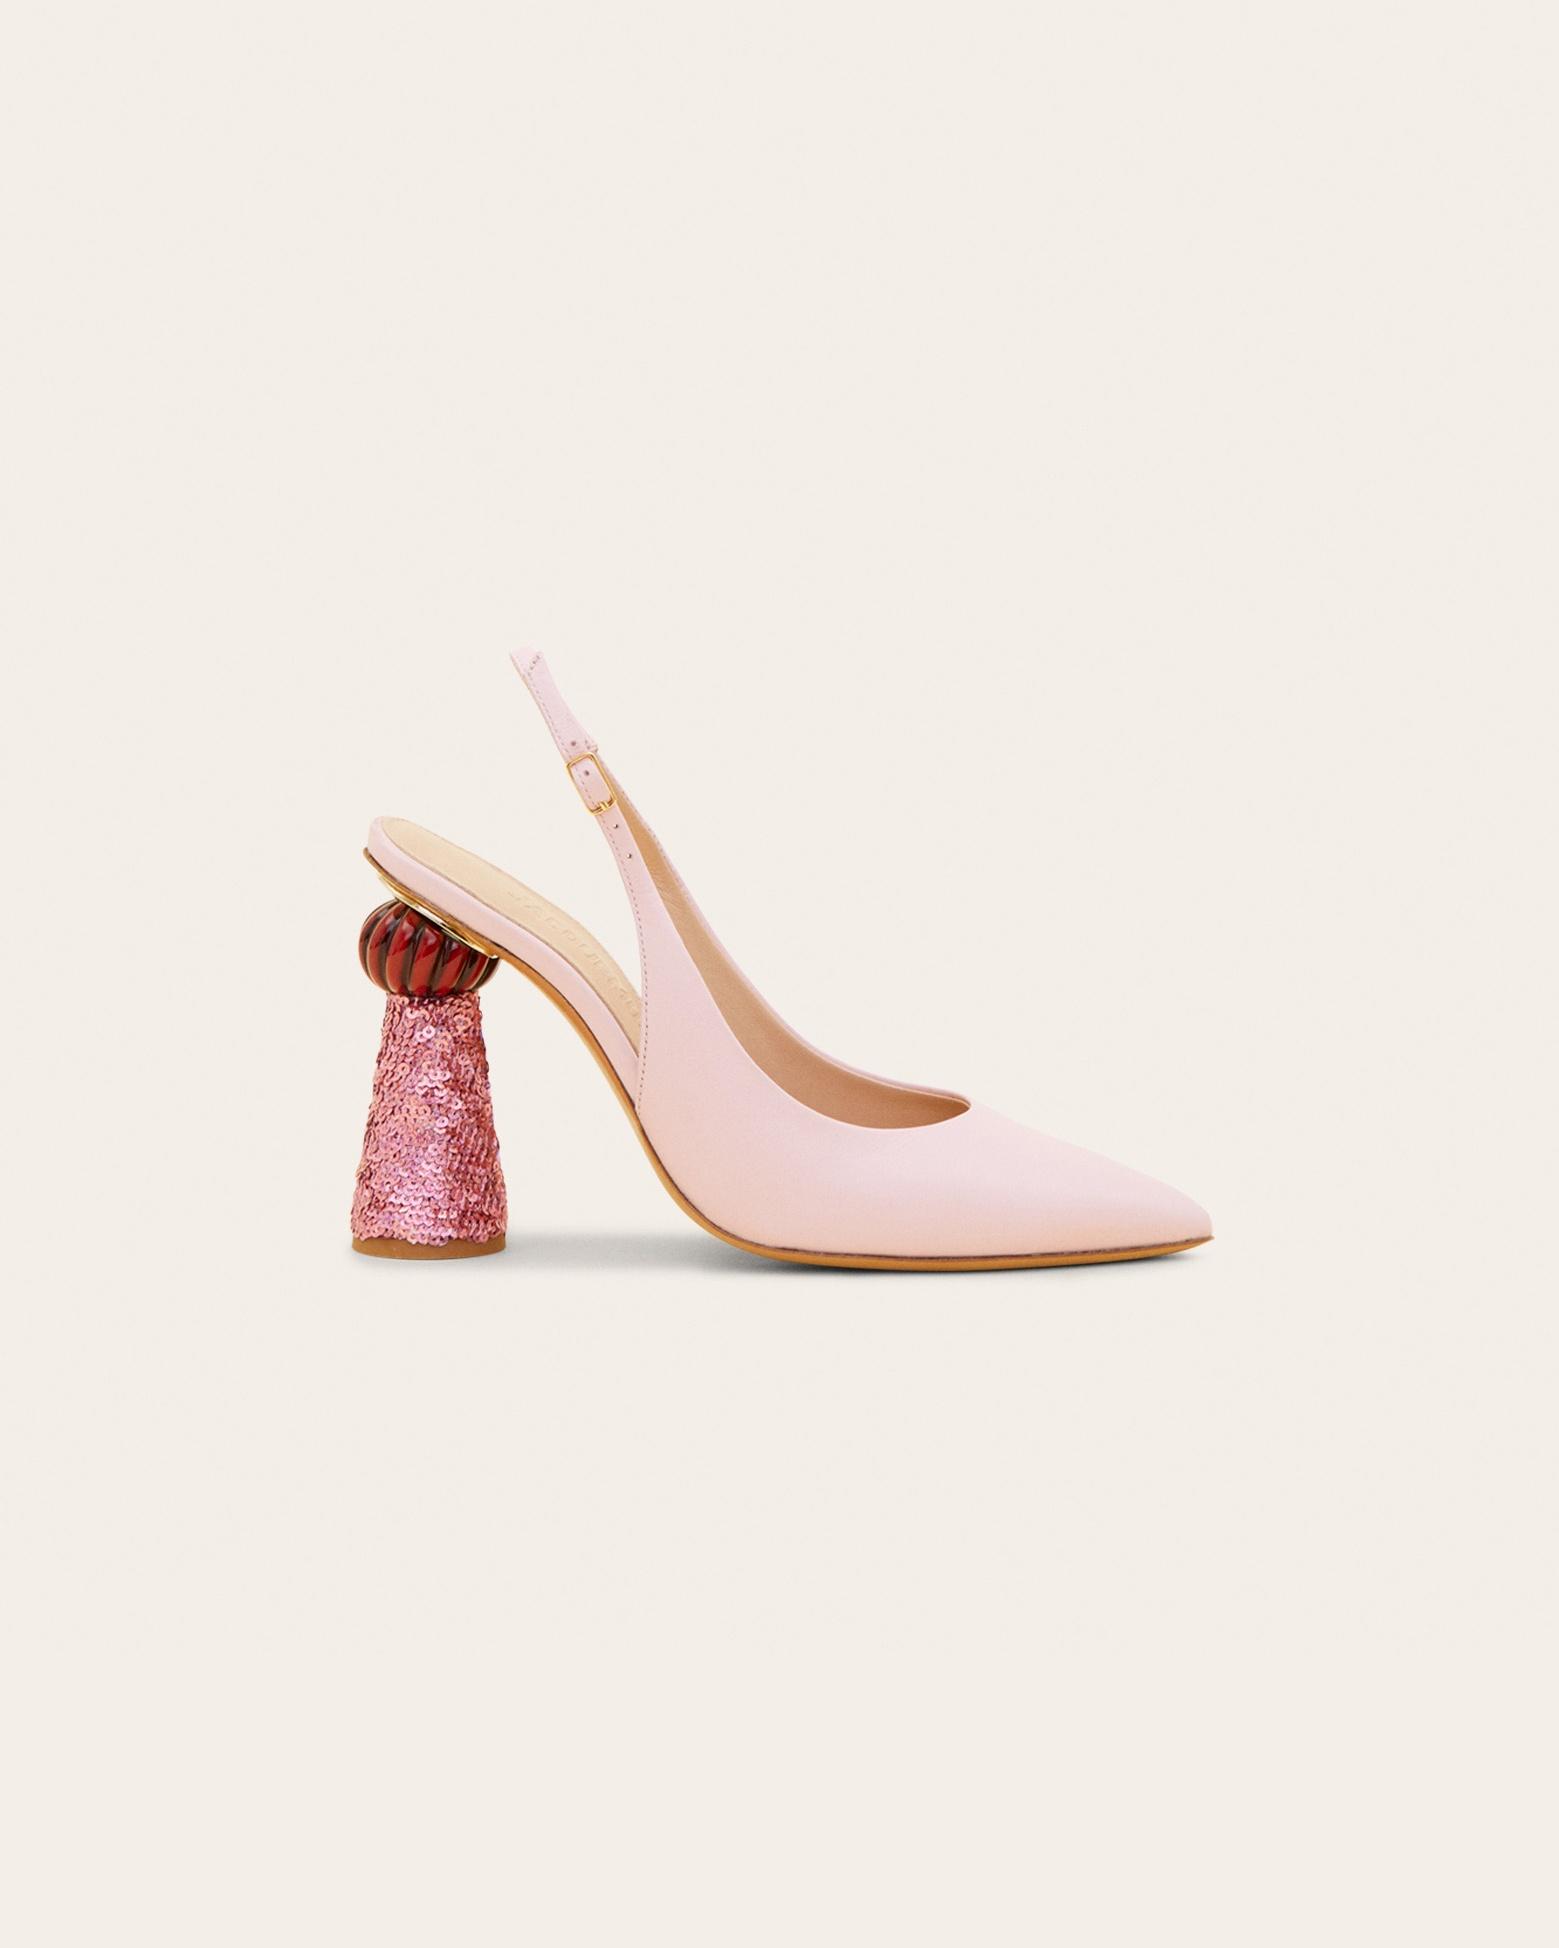 Les chaussures Loiza